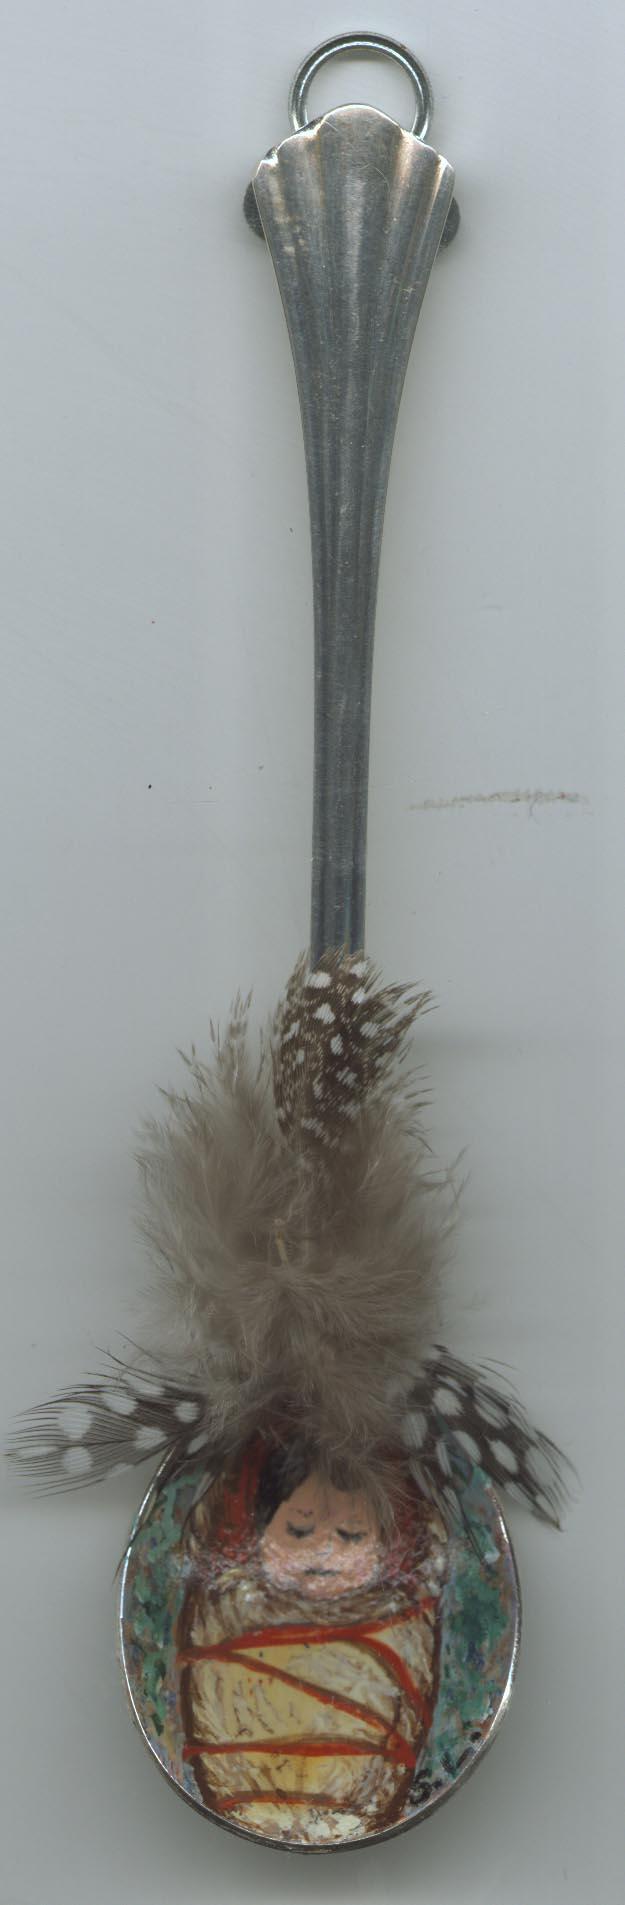 christinasspoon-2.jpg